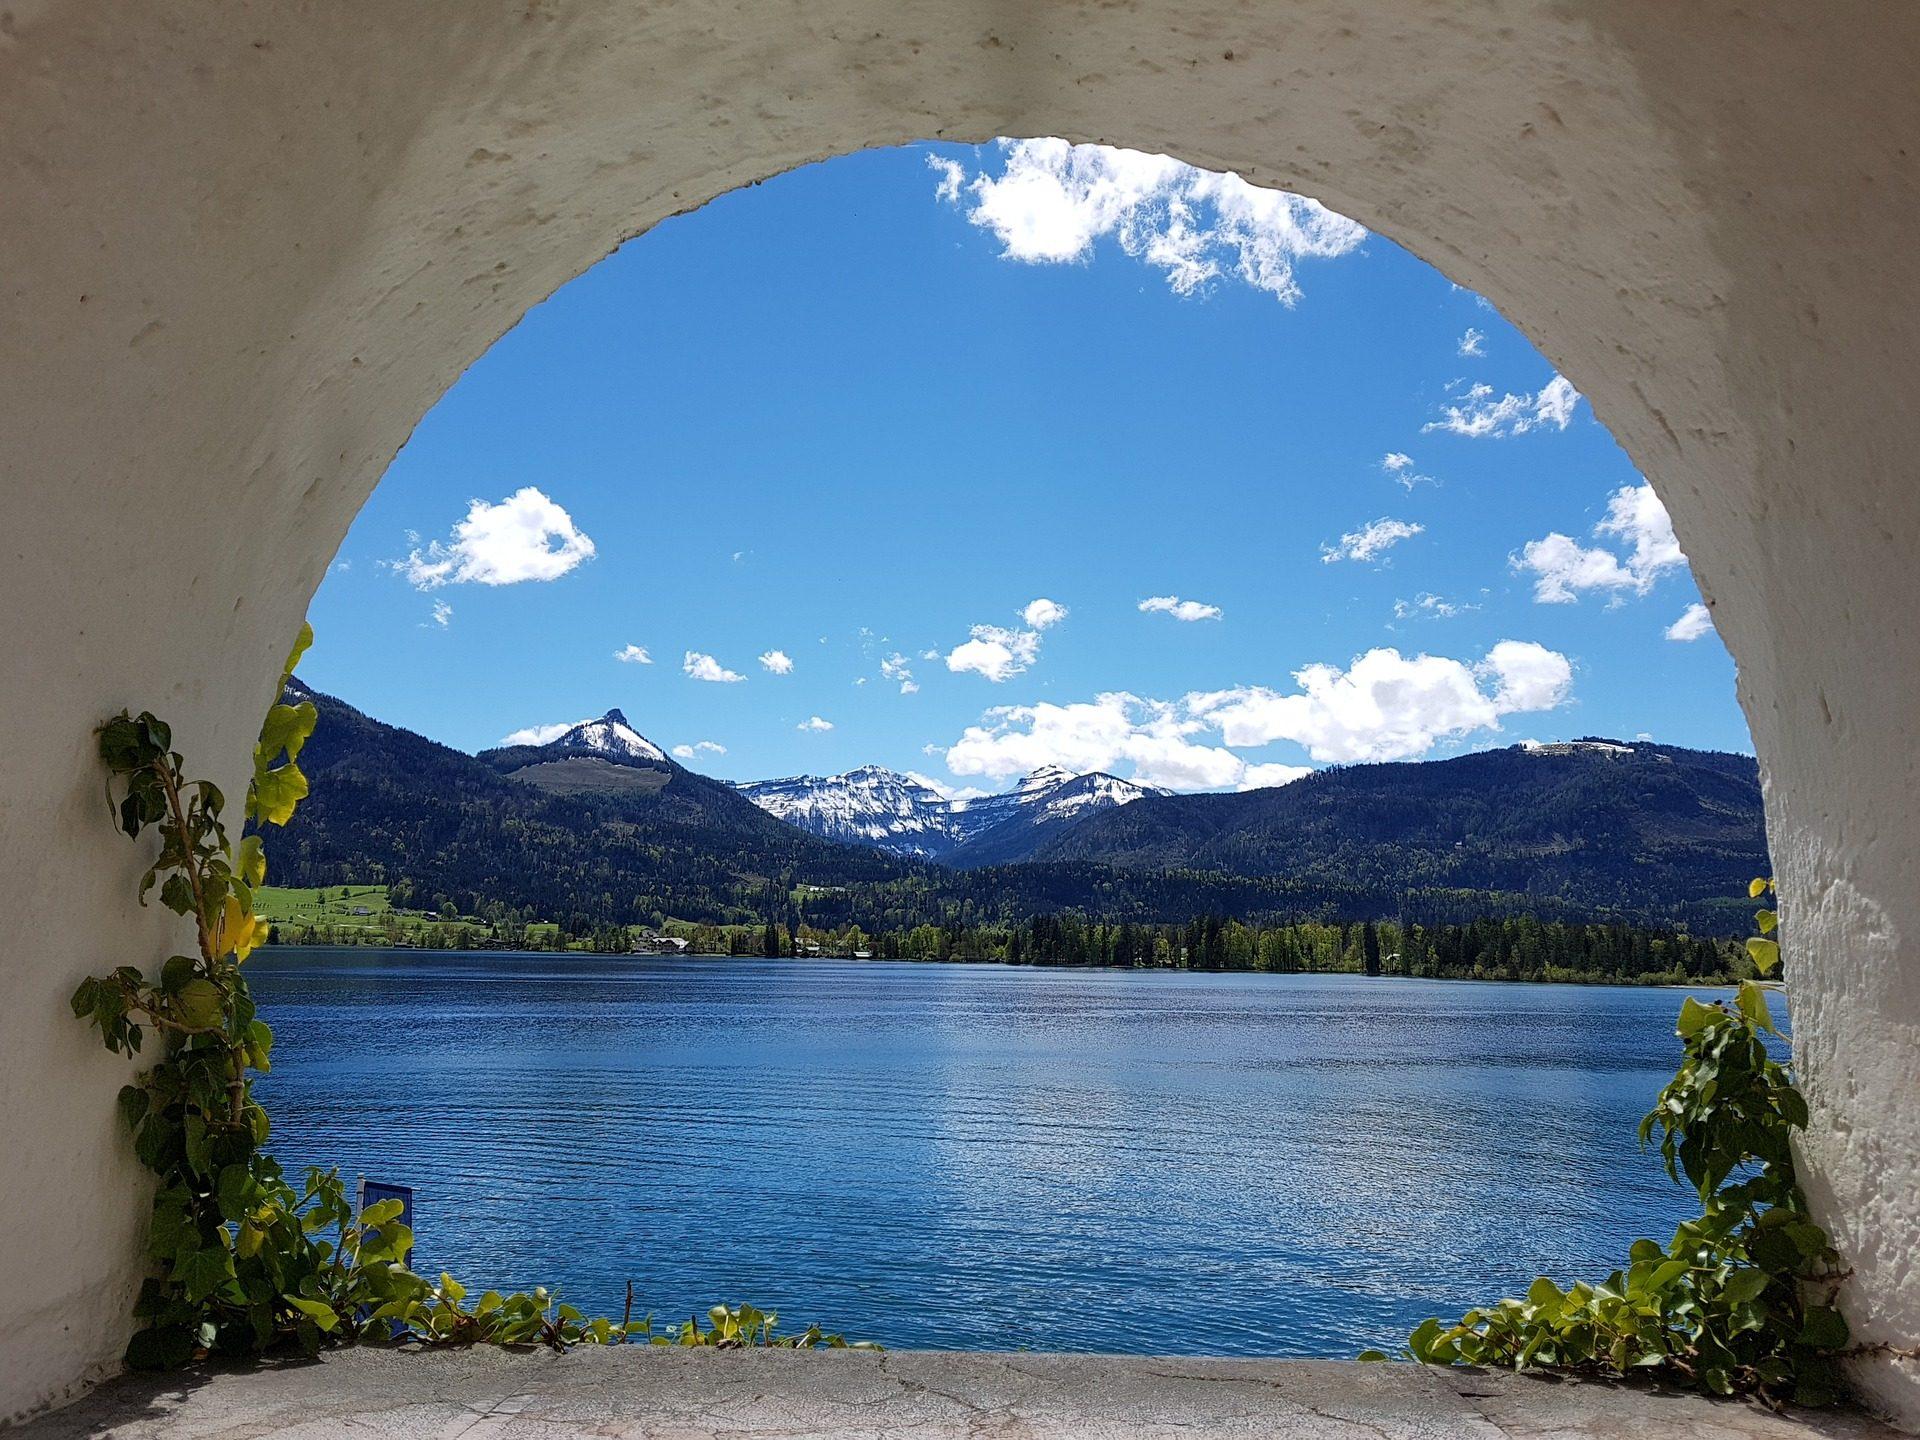 arco, lago, montañas, árboles, nieve, cielo, nubes - Fondos de Pantalla HD - professor-falken.com